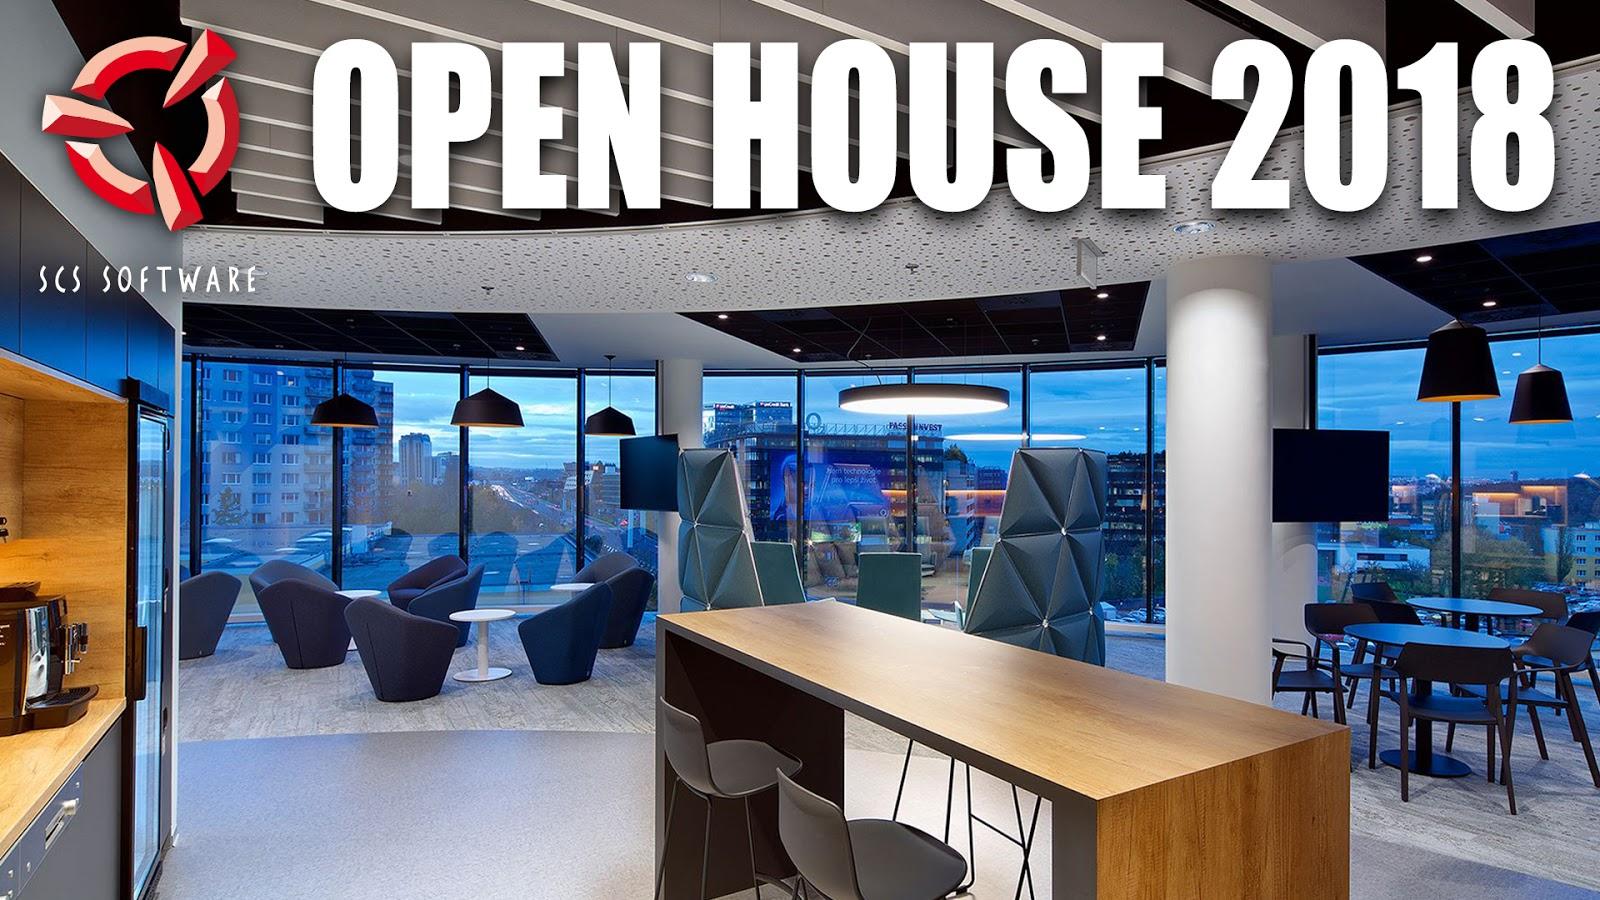 Open-House 2018